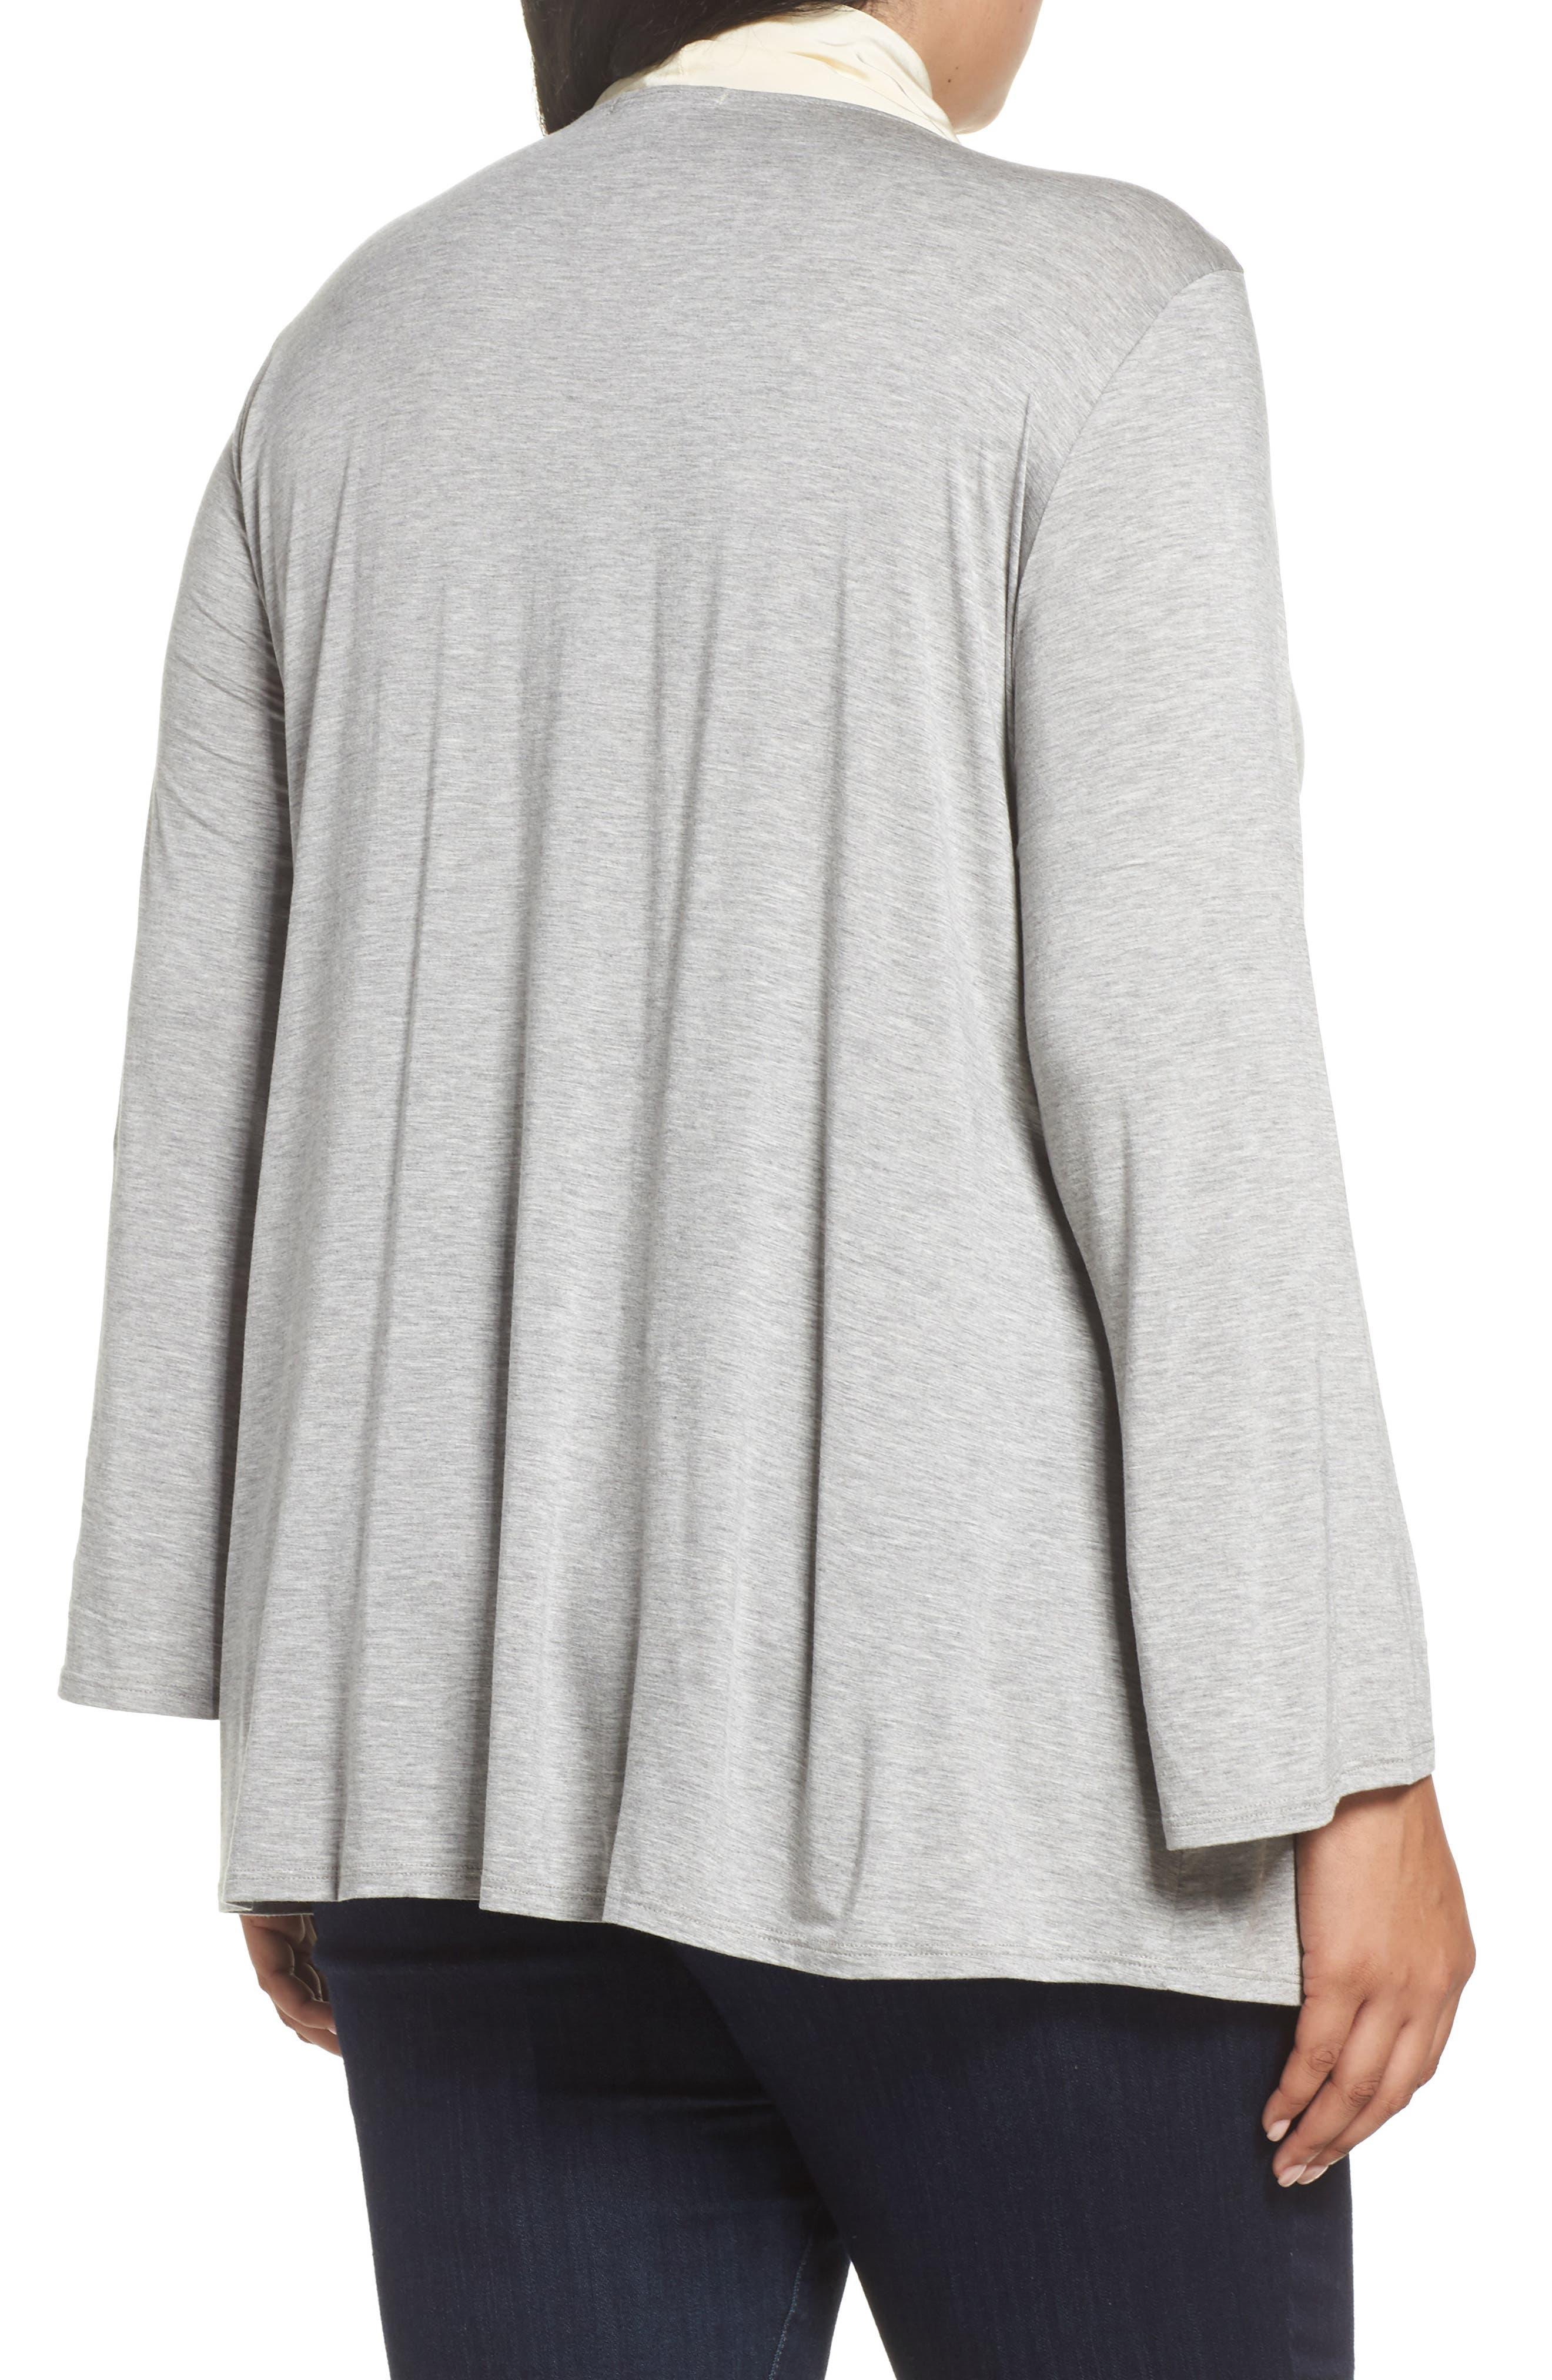 Alternate Image 2  - Three Dots Tie Neck Jersey Top (Plus Size)